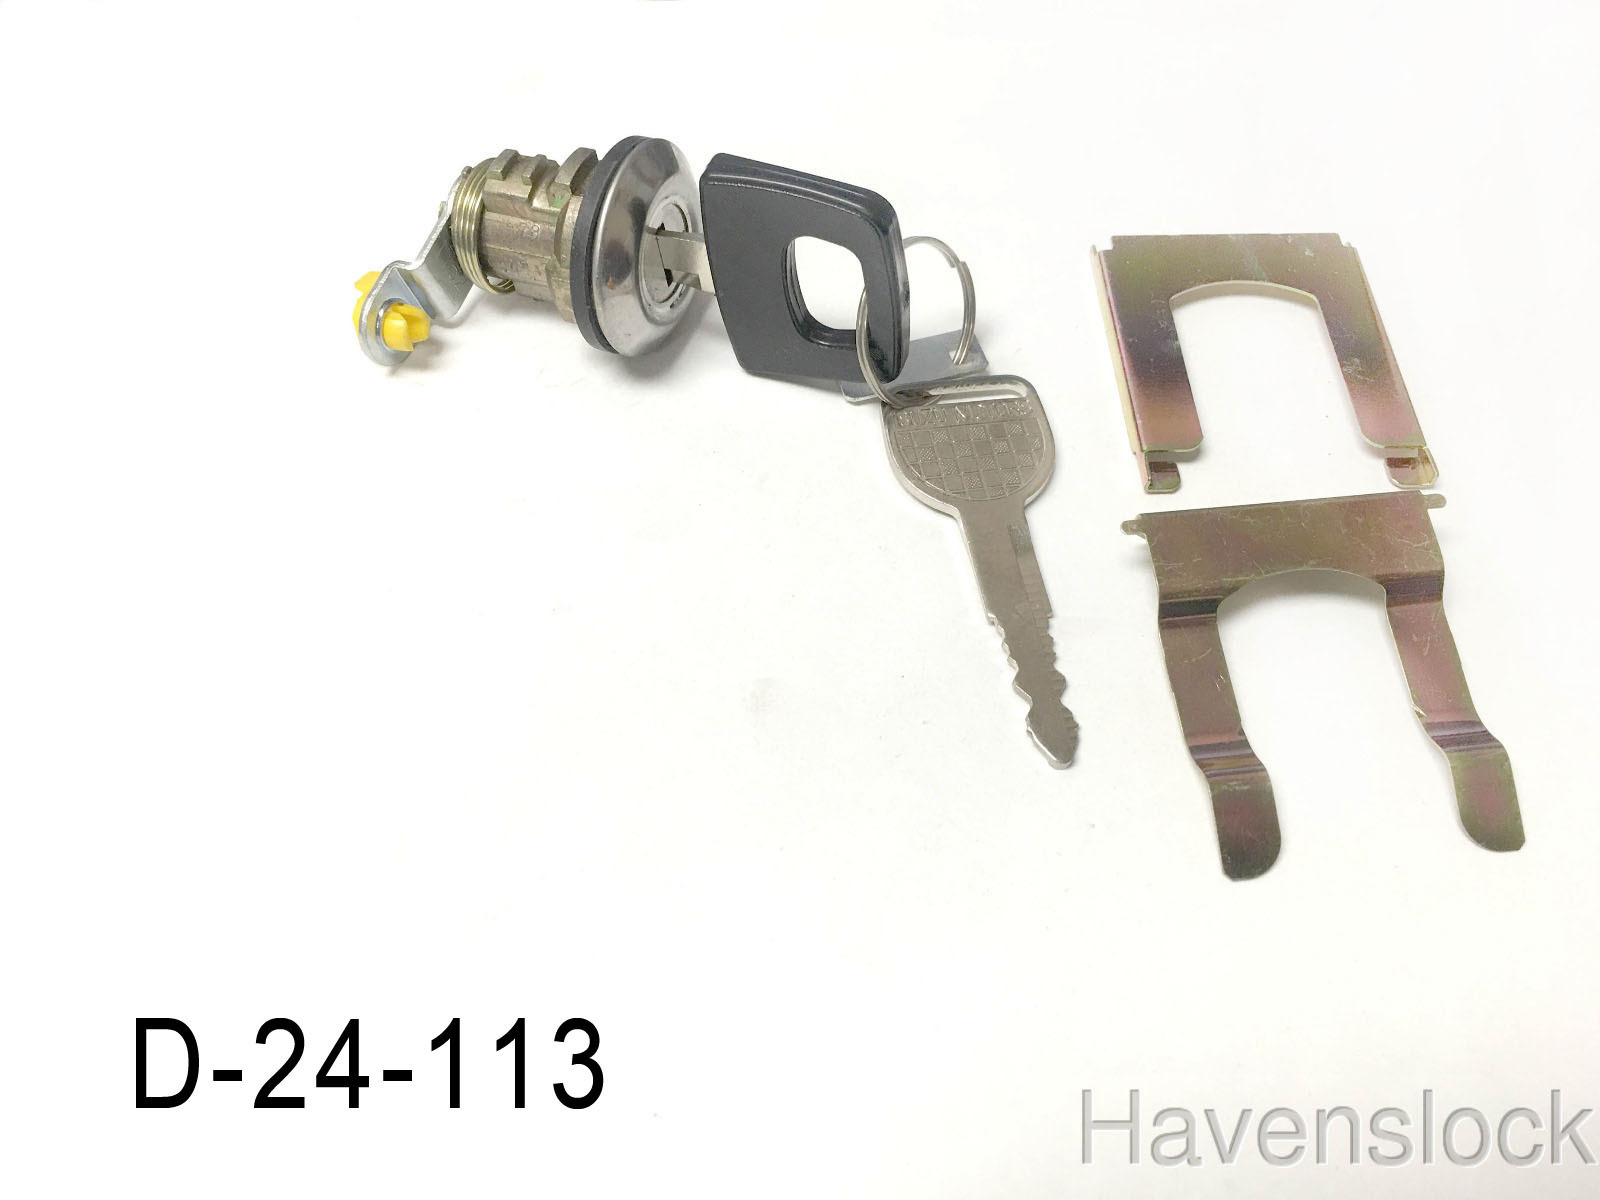 ASP Vintage Auto Lock Cylinders, Choice (D-24-113,